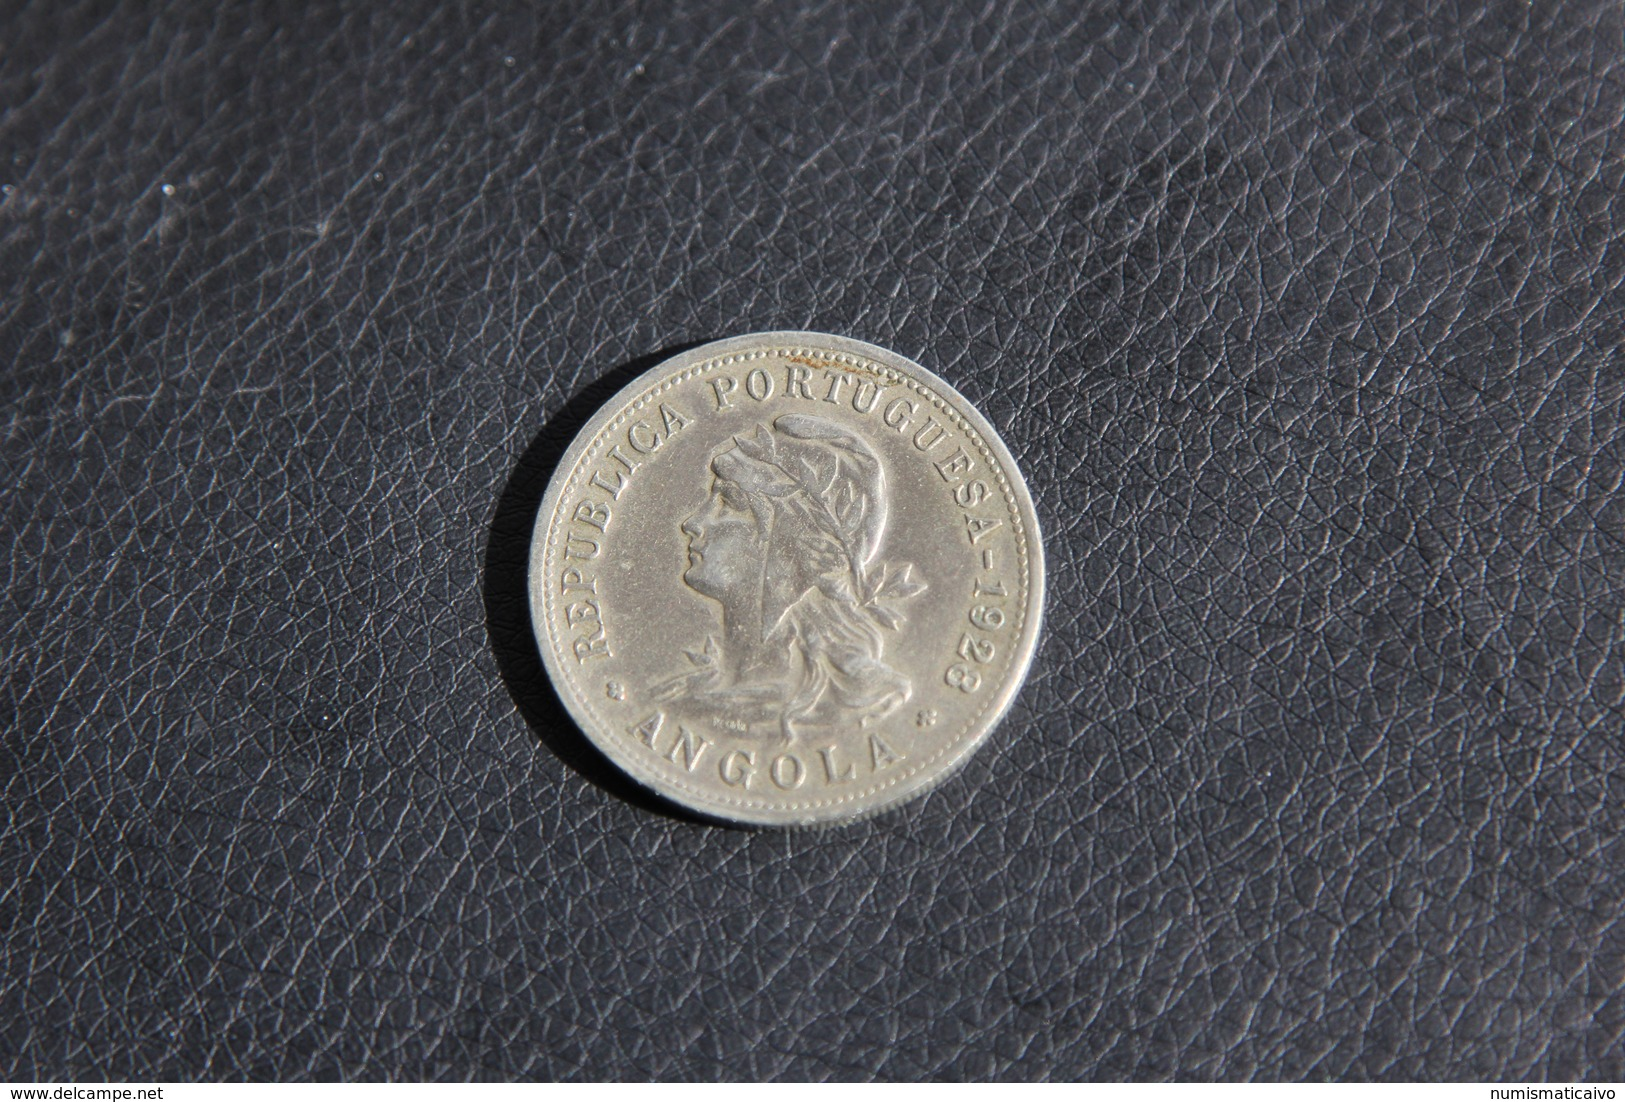 IVO 50 CENTAVOS 1928 ANGOLA PORTUGAL COIN - Angola